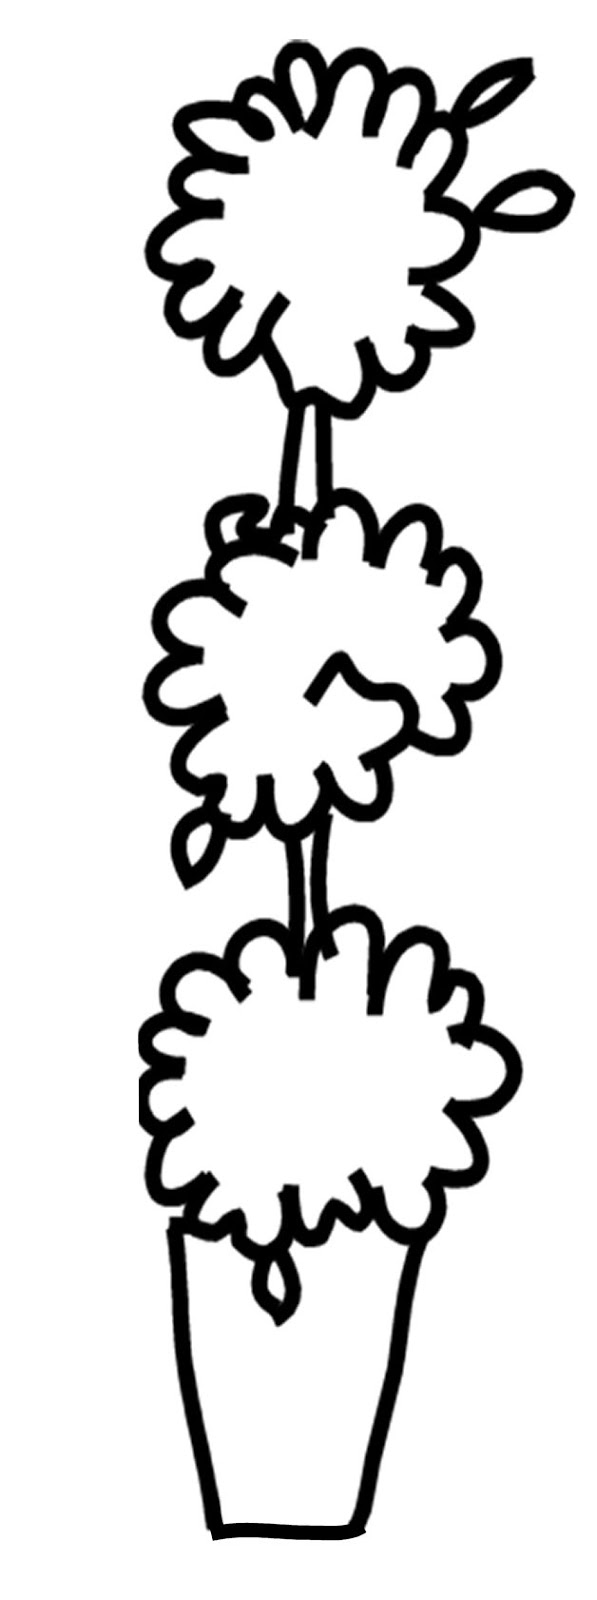 http://2.bp.blogspot.com/-i6cLf-L5ad0/VNBOp9L2GZI/AAAAAAAAMpA/26ok9dcCwLQ/s1600/Topiary.jpg